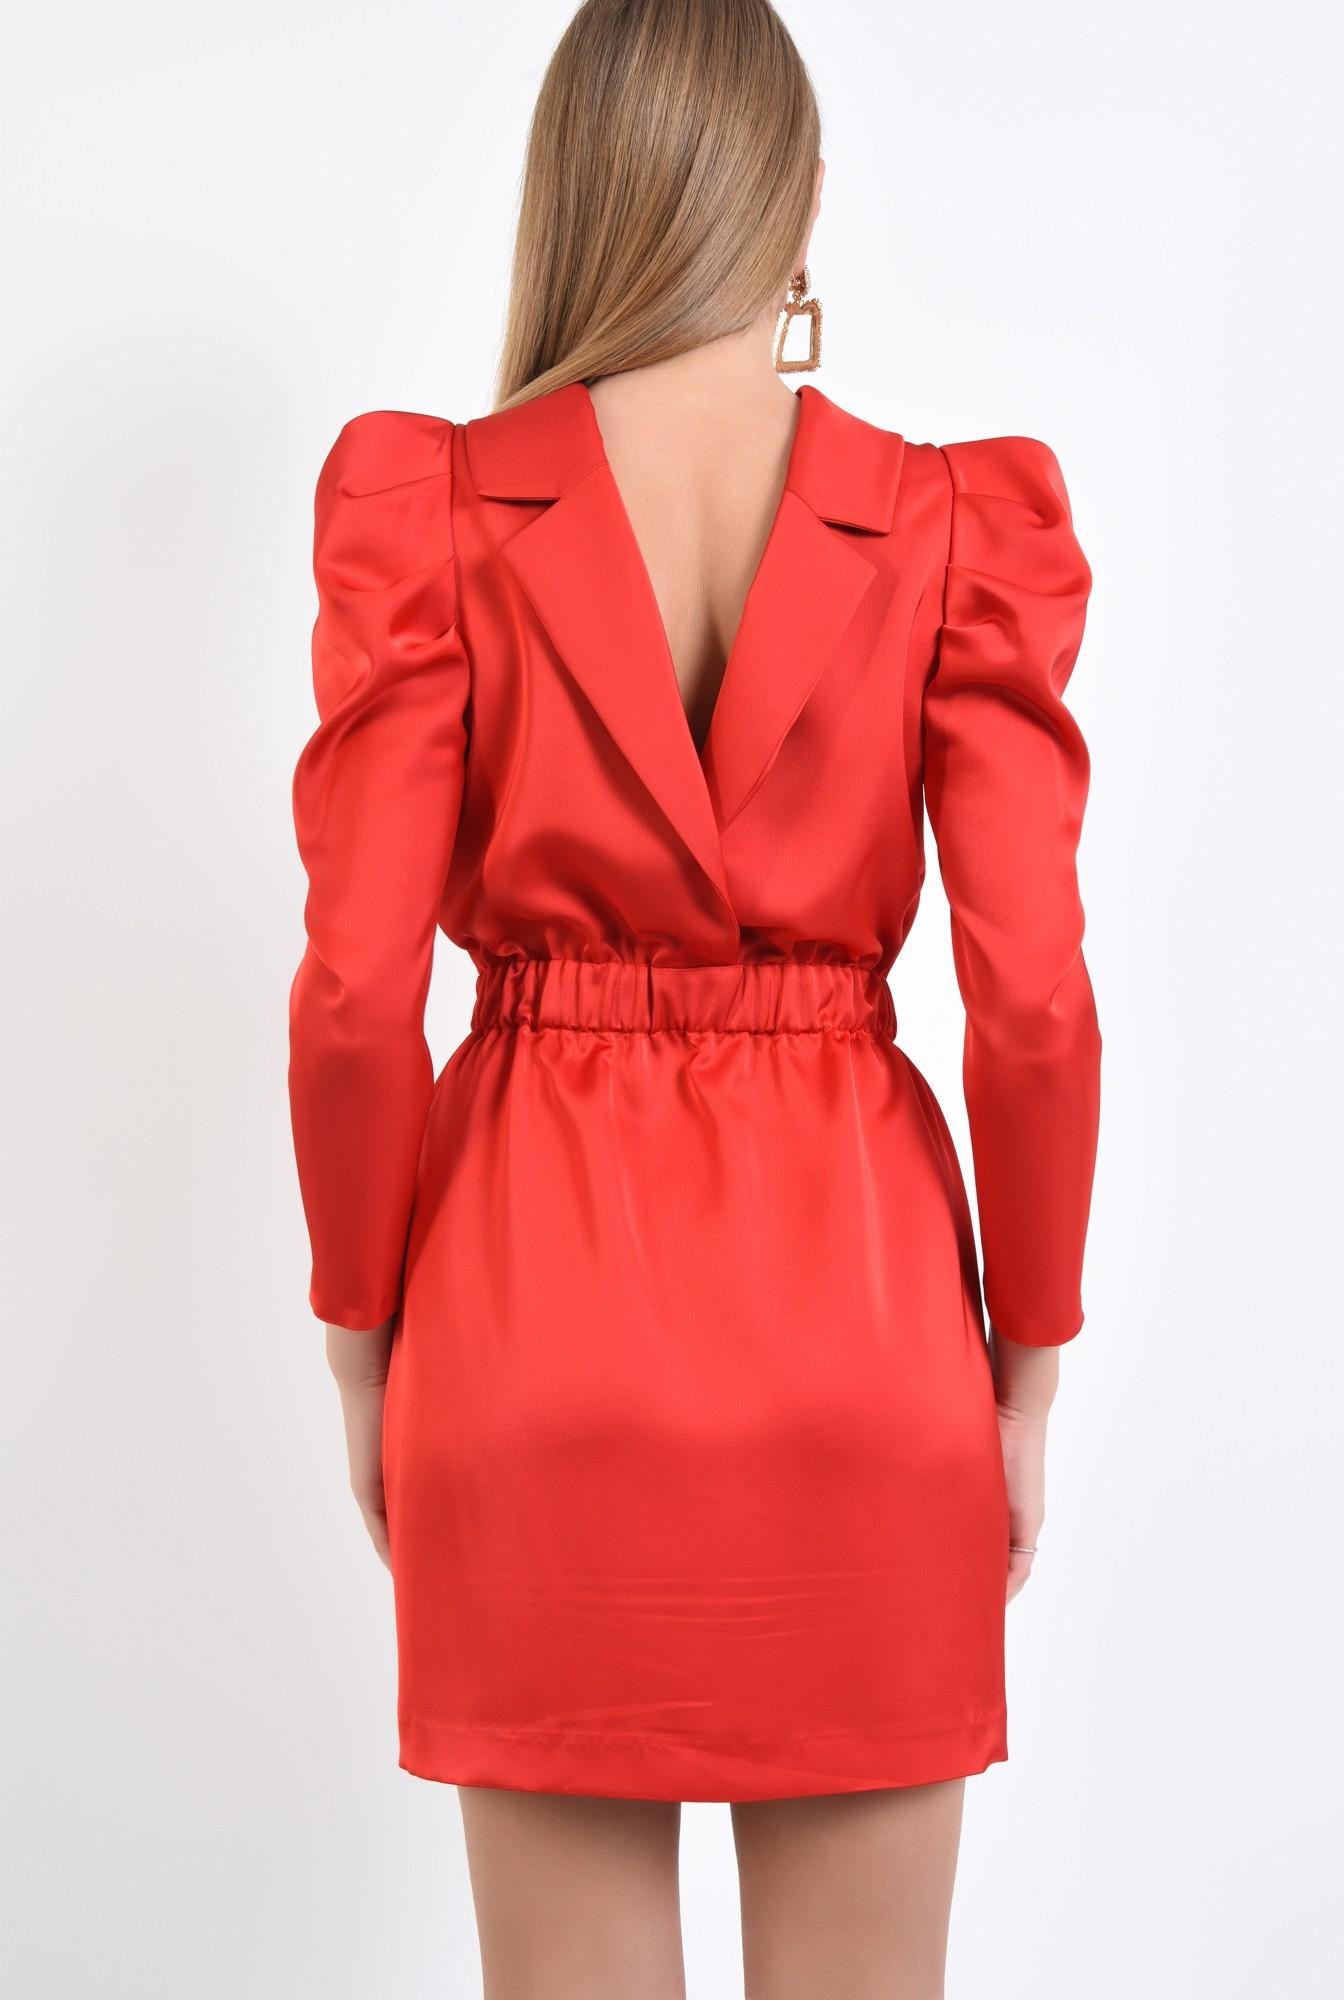 1 - 360 - rochie eleganta, mini, maneci cu cret la umar, spate gol